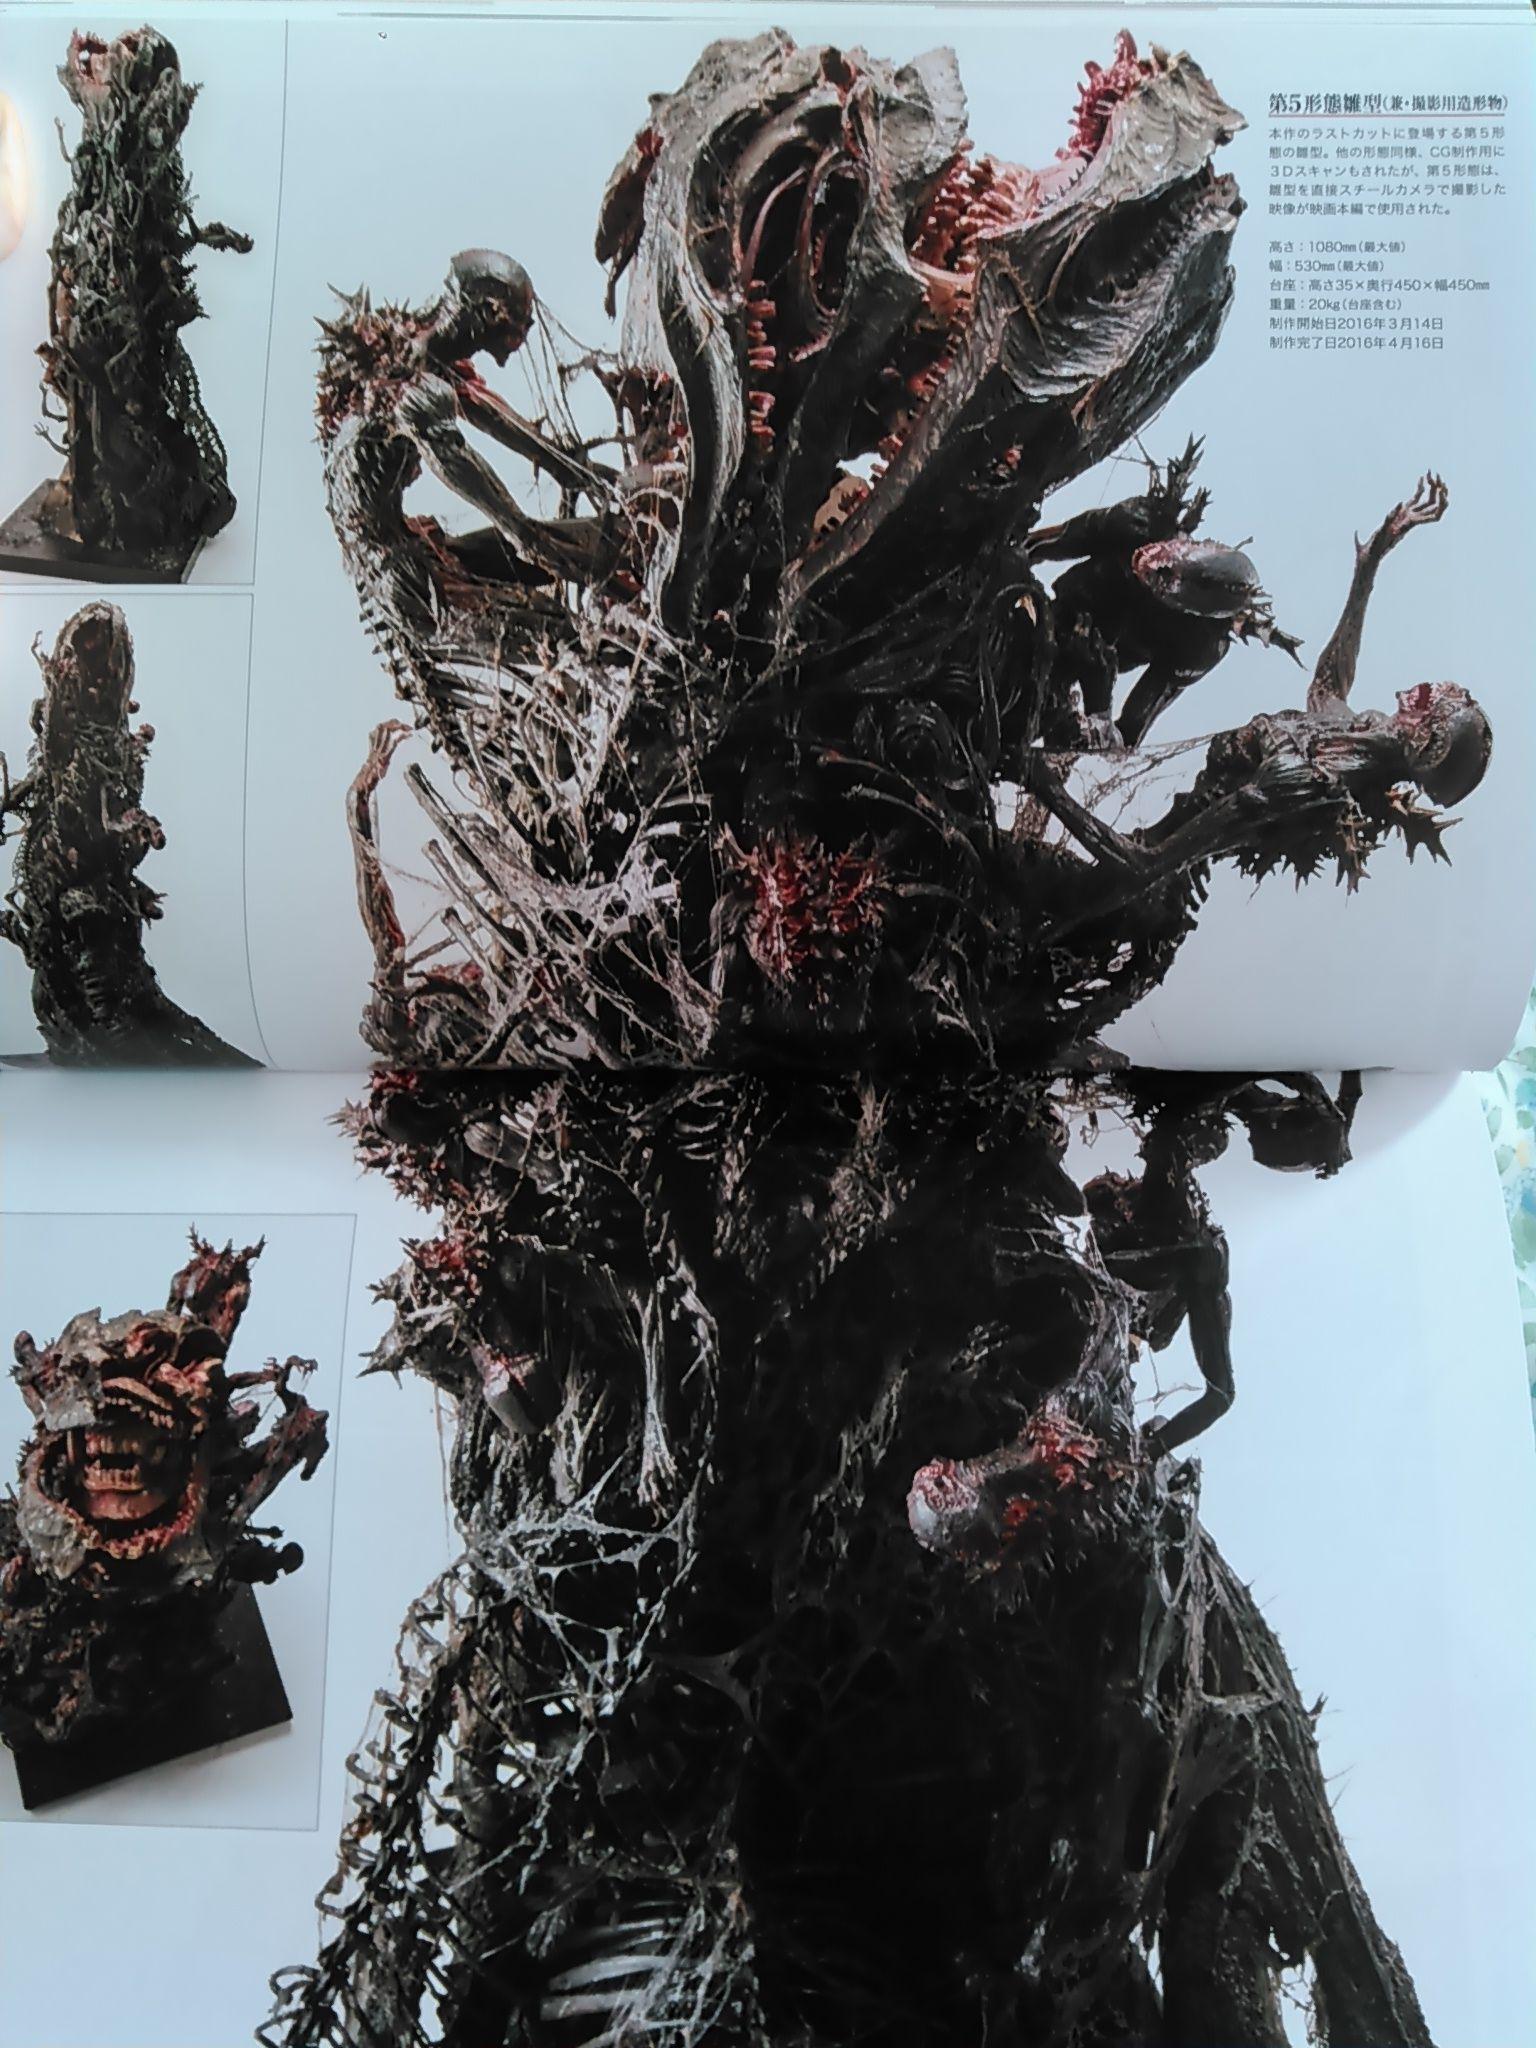 Godzilla's human form. | Gojira and Friends | Pinterest | Godzilla ...